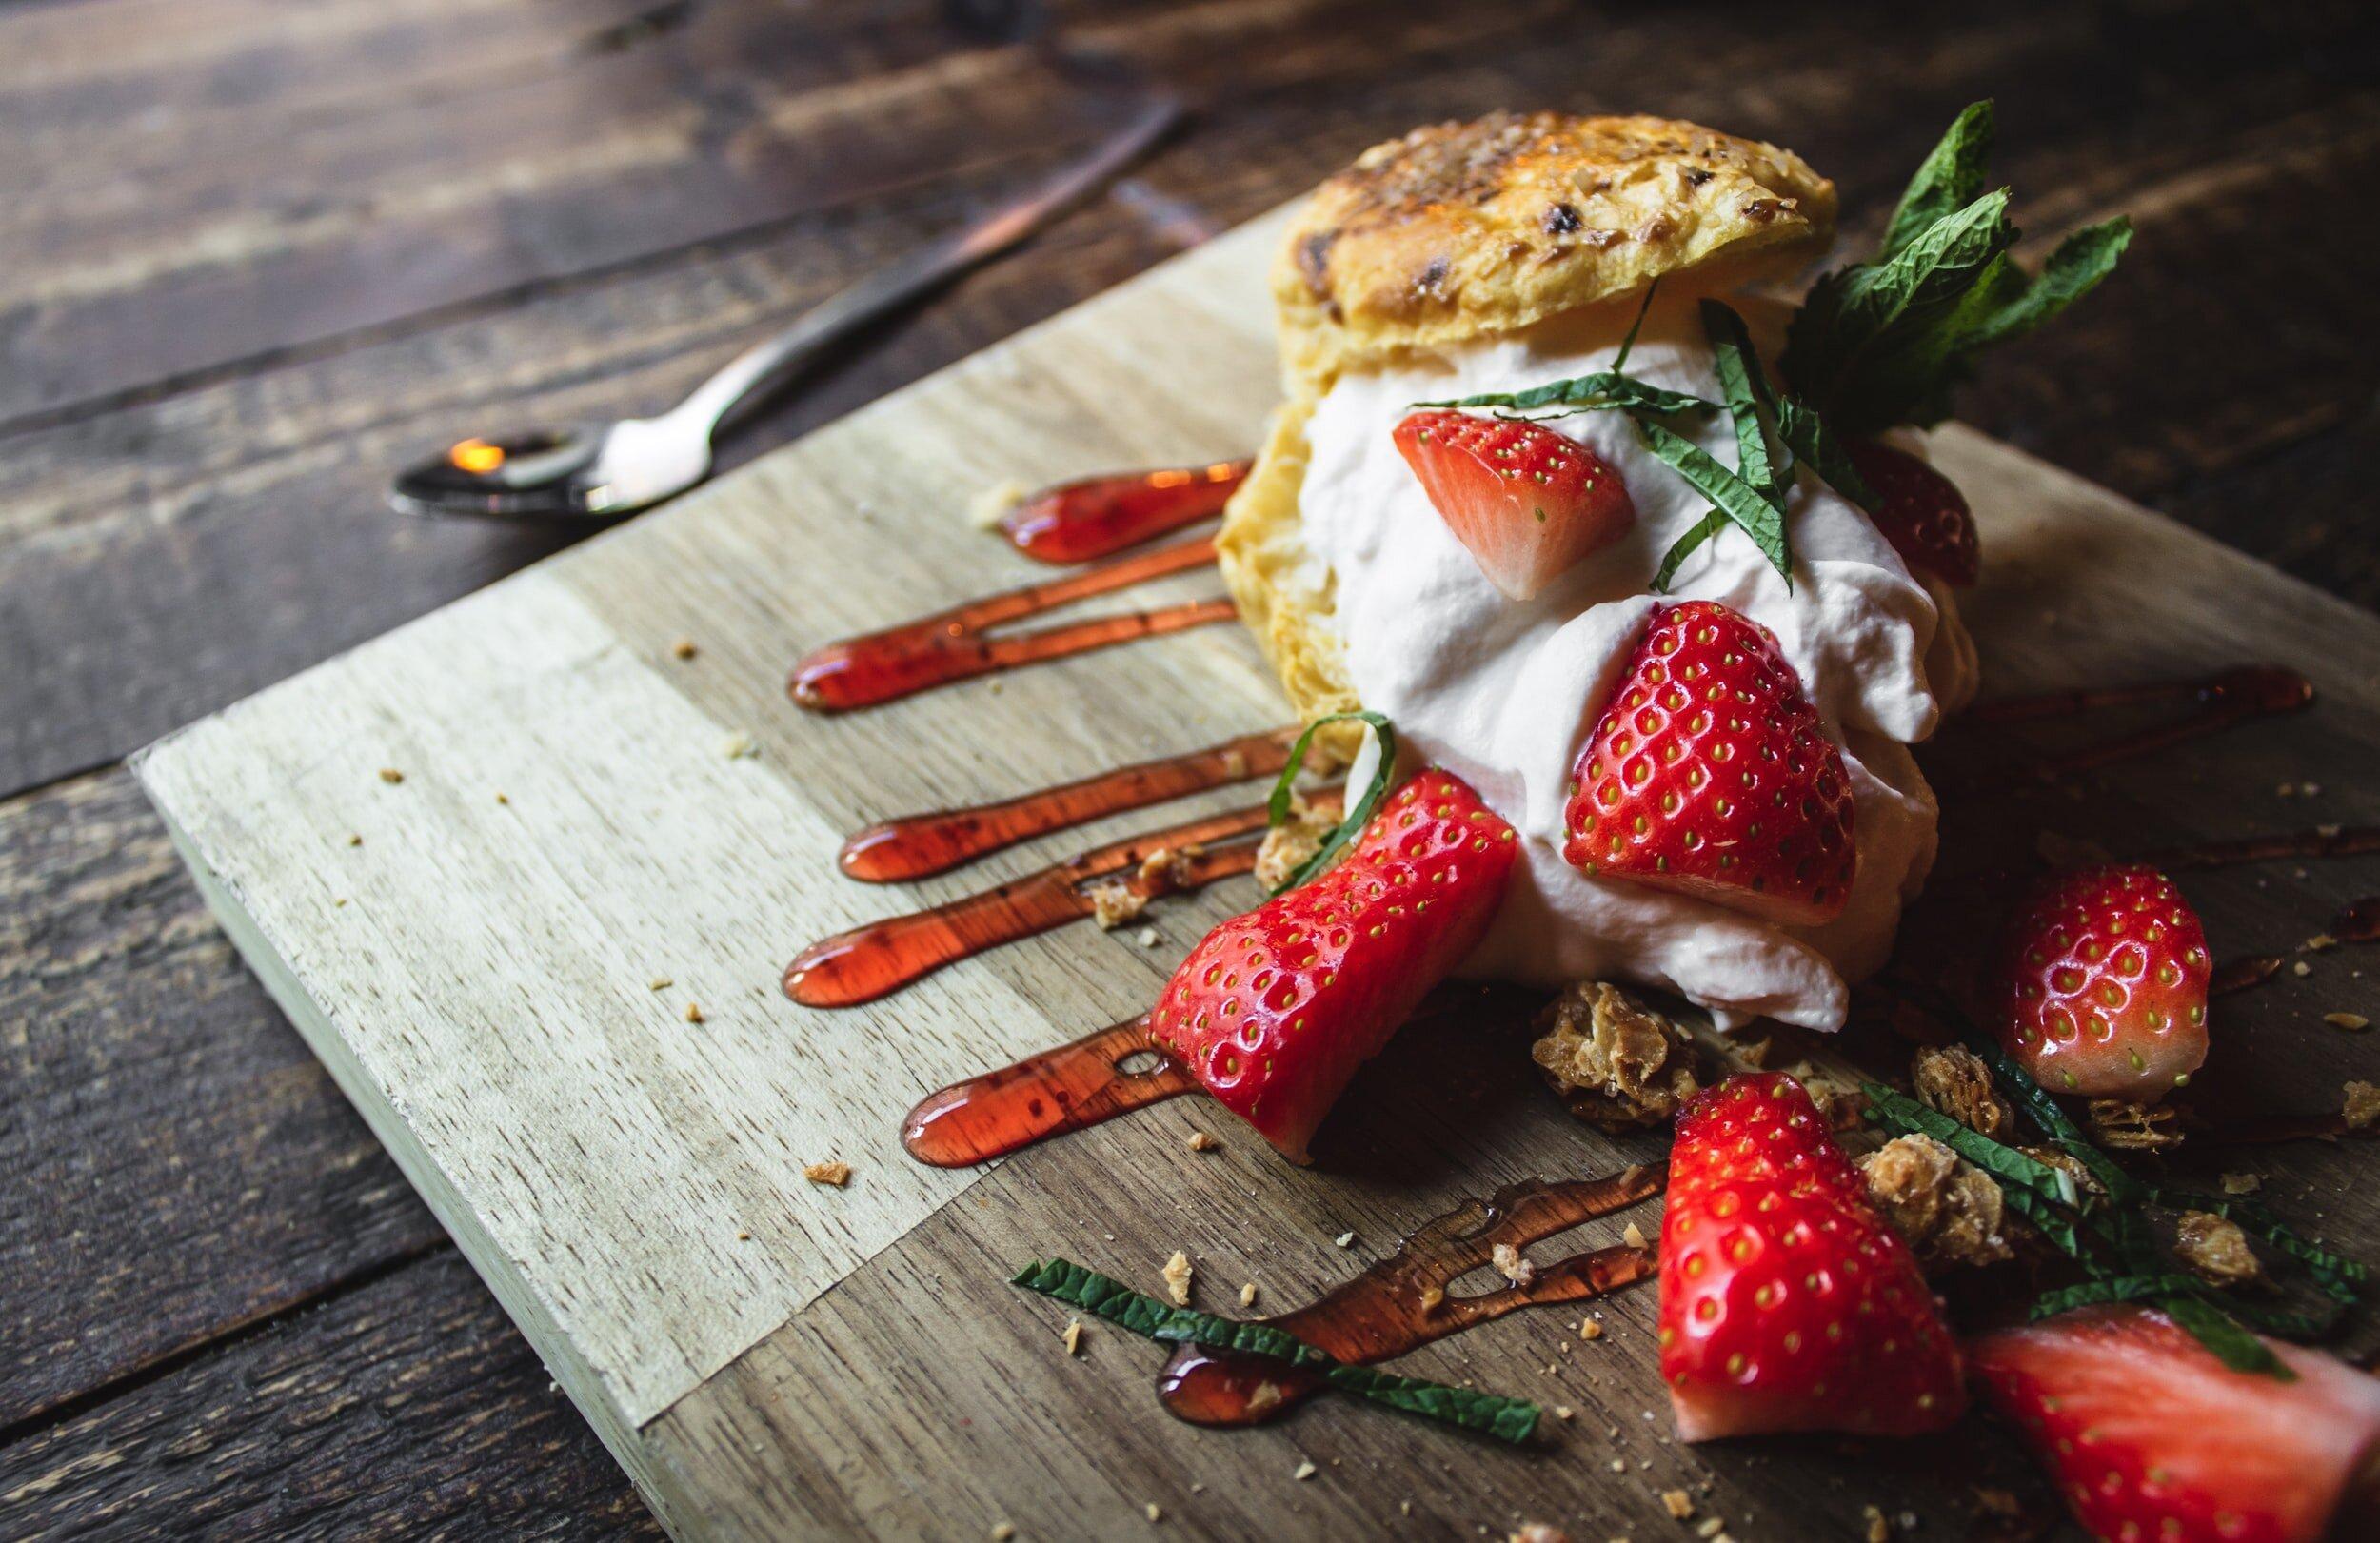 Italian Crostata (Jam Tart) and other regional desserts. - cover